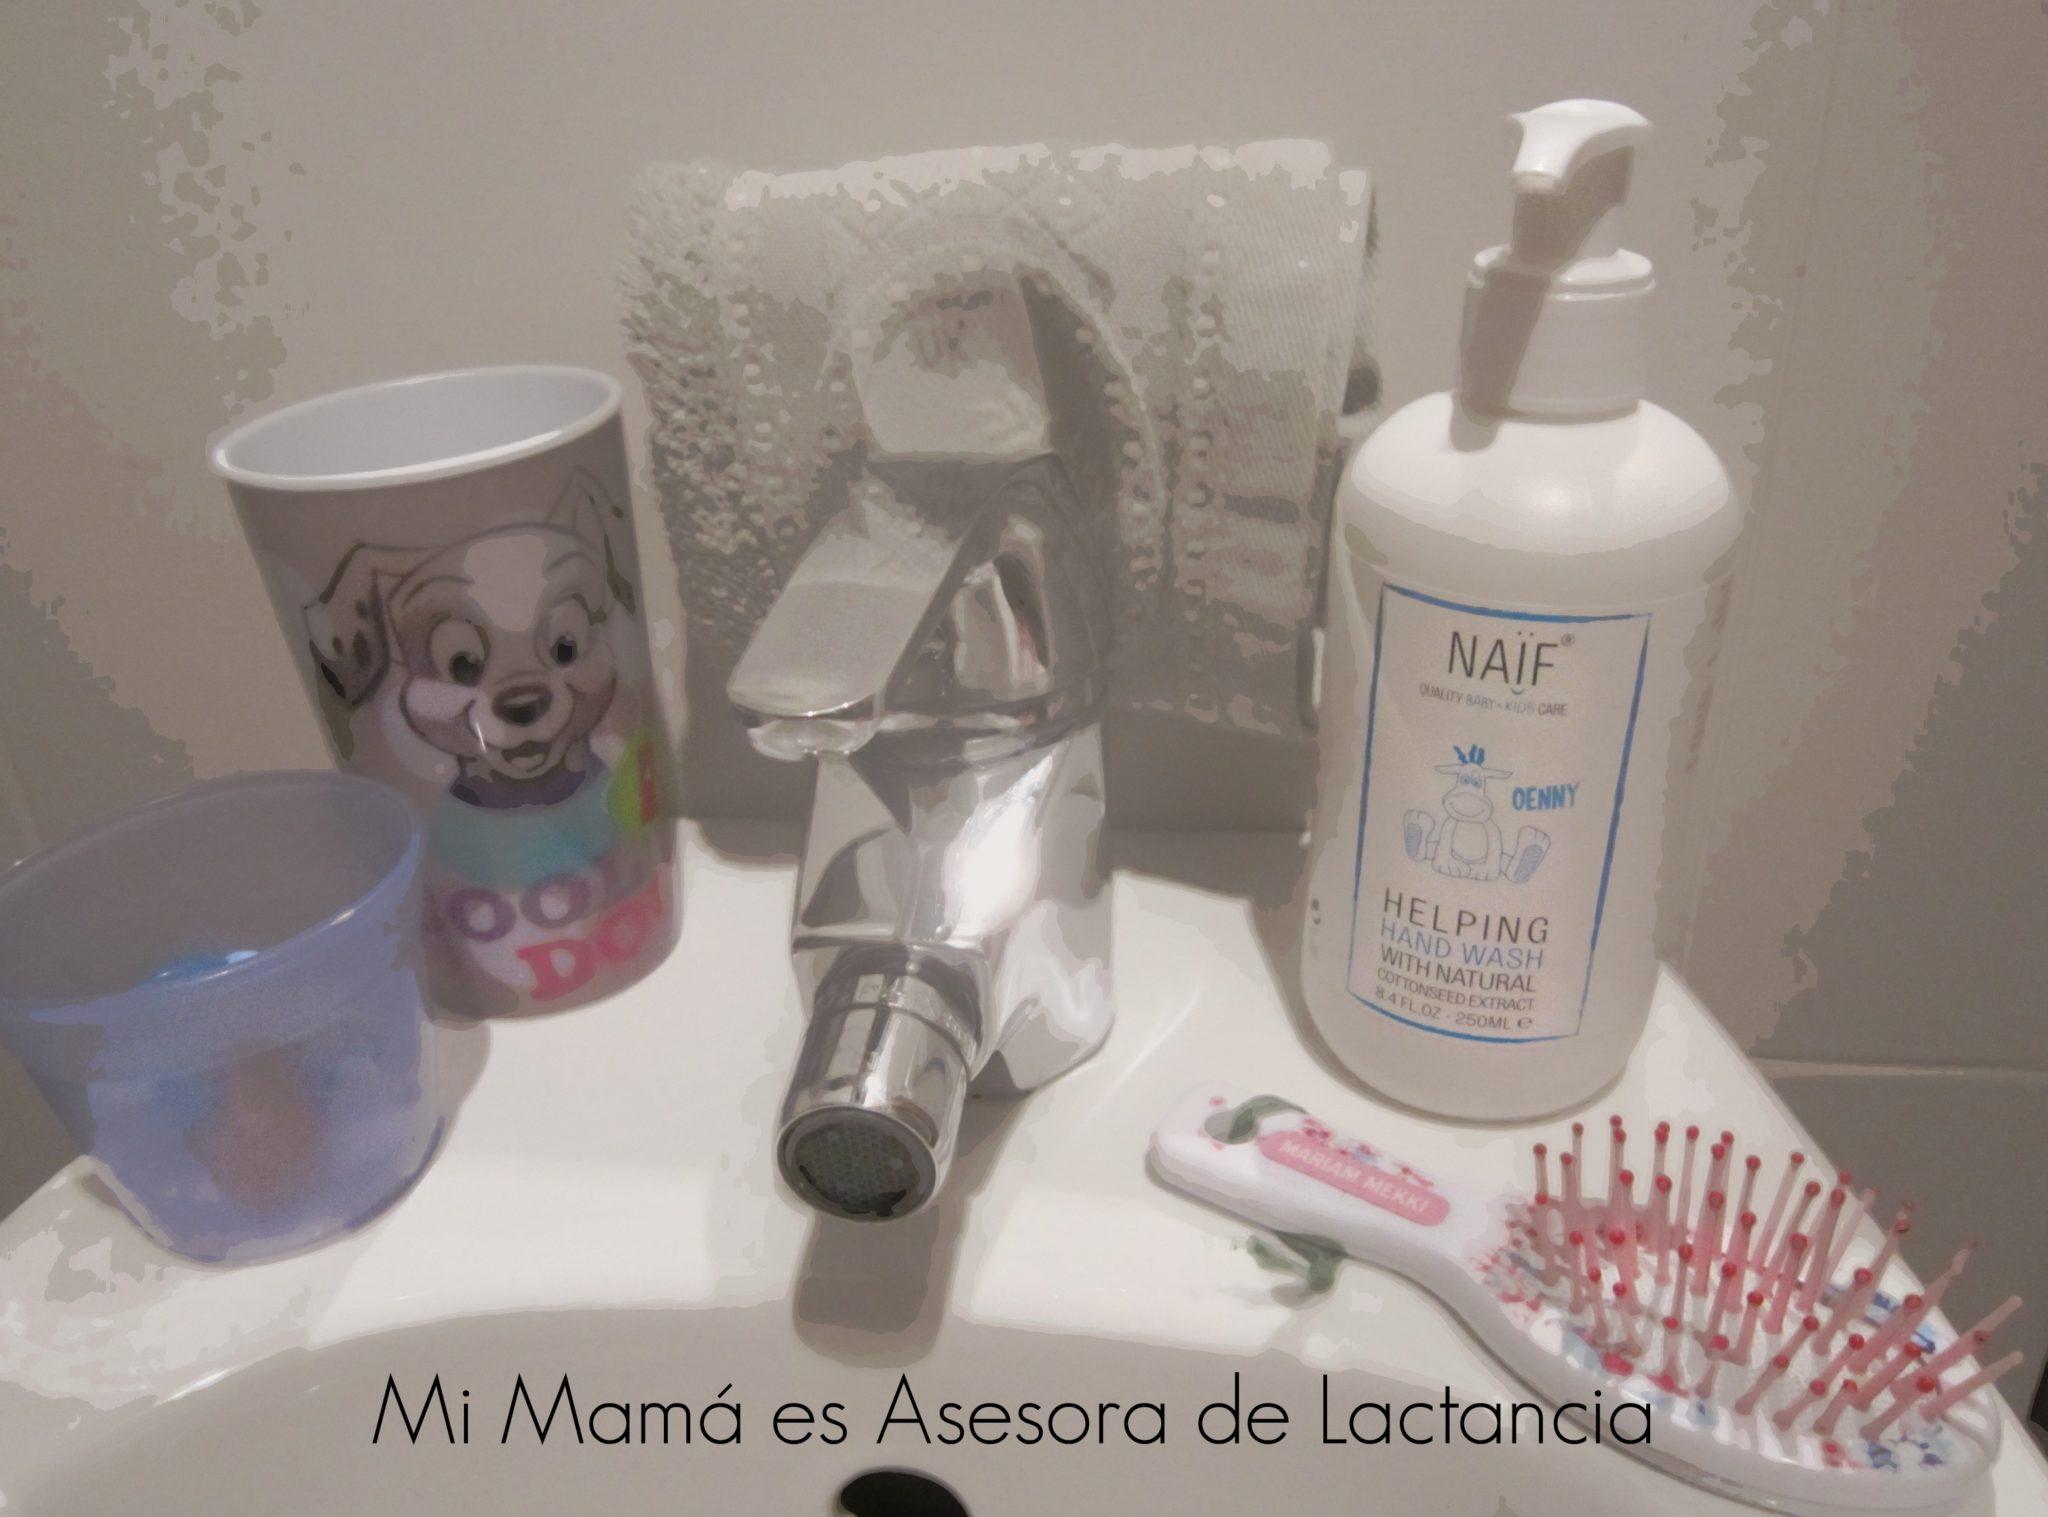 bac3b1o naif - Naïf Baby Care: cuidando la piel